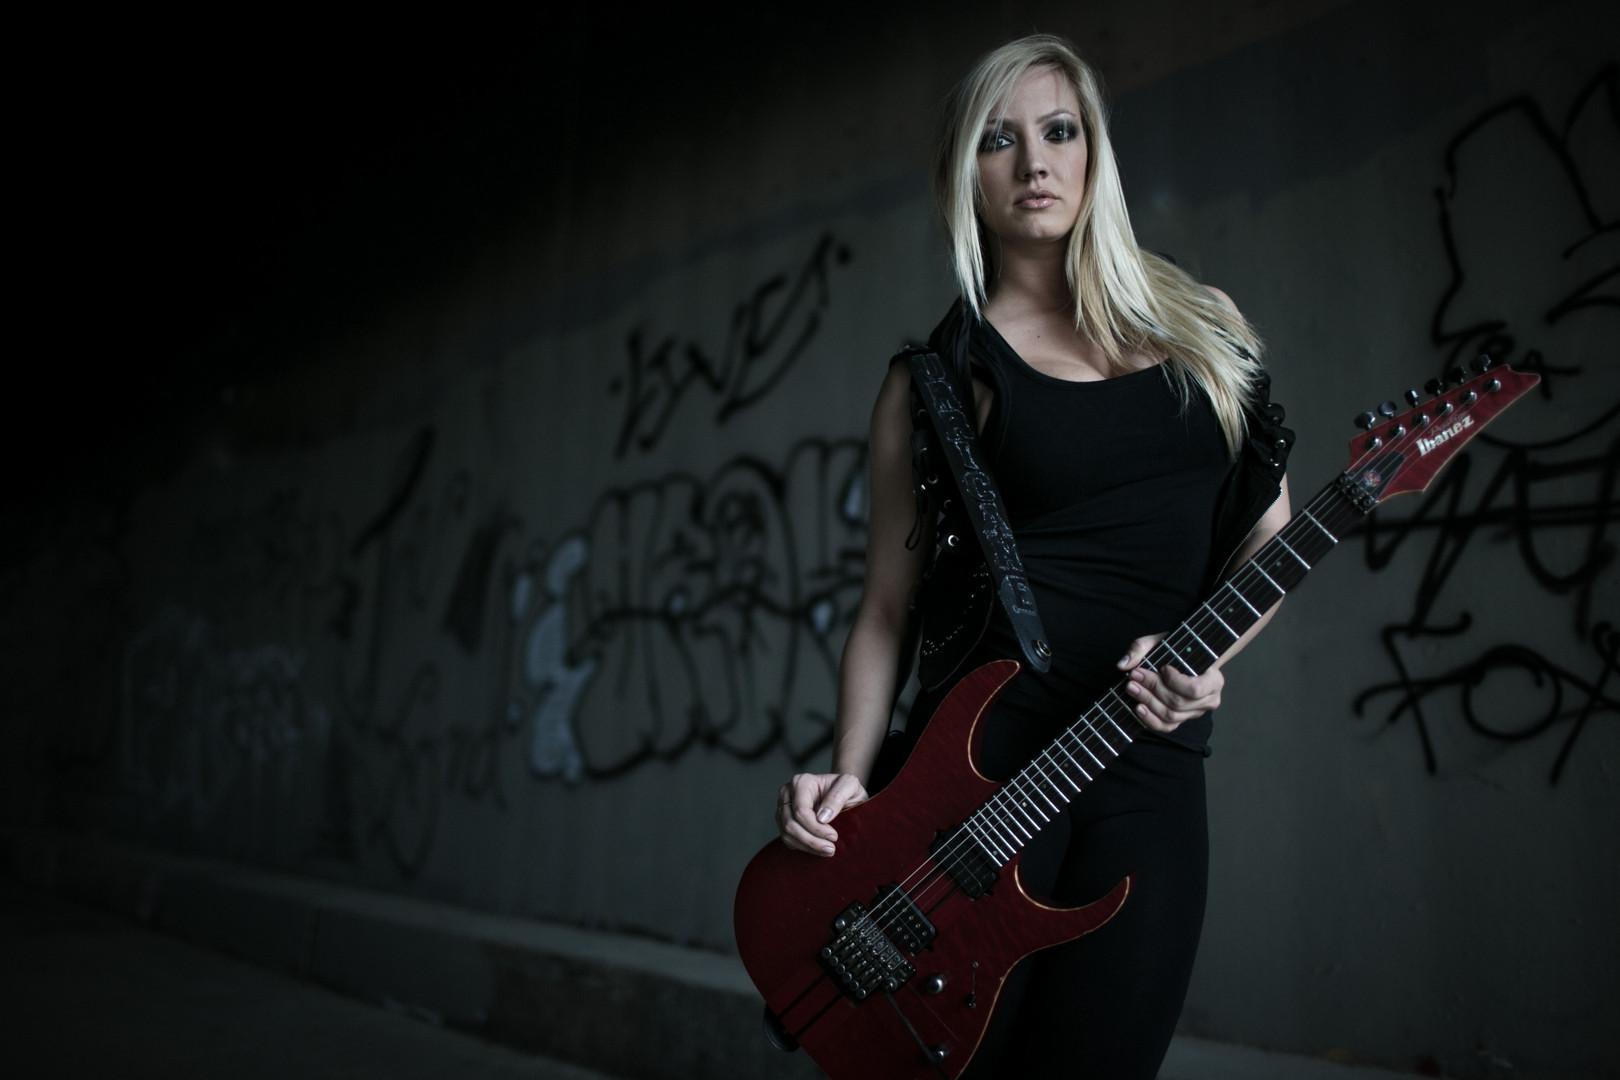 Guitarist Nita Strauss